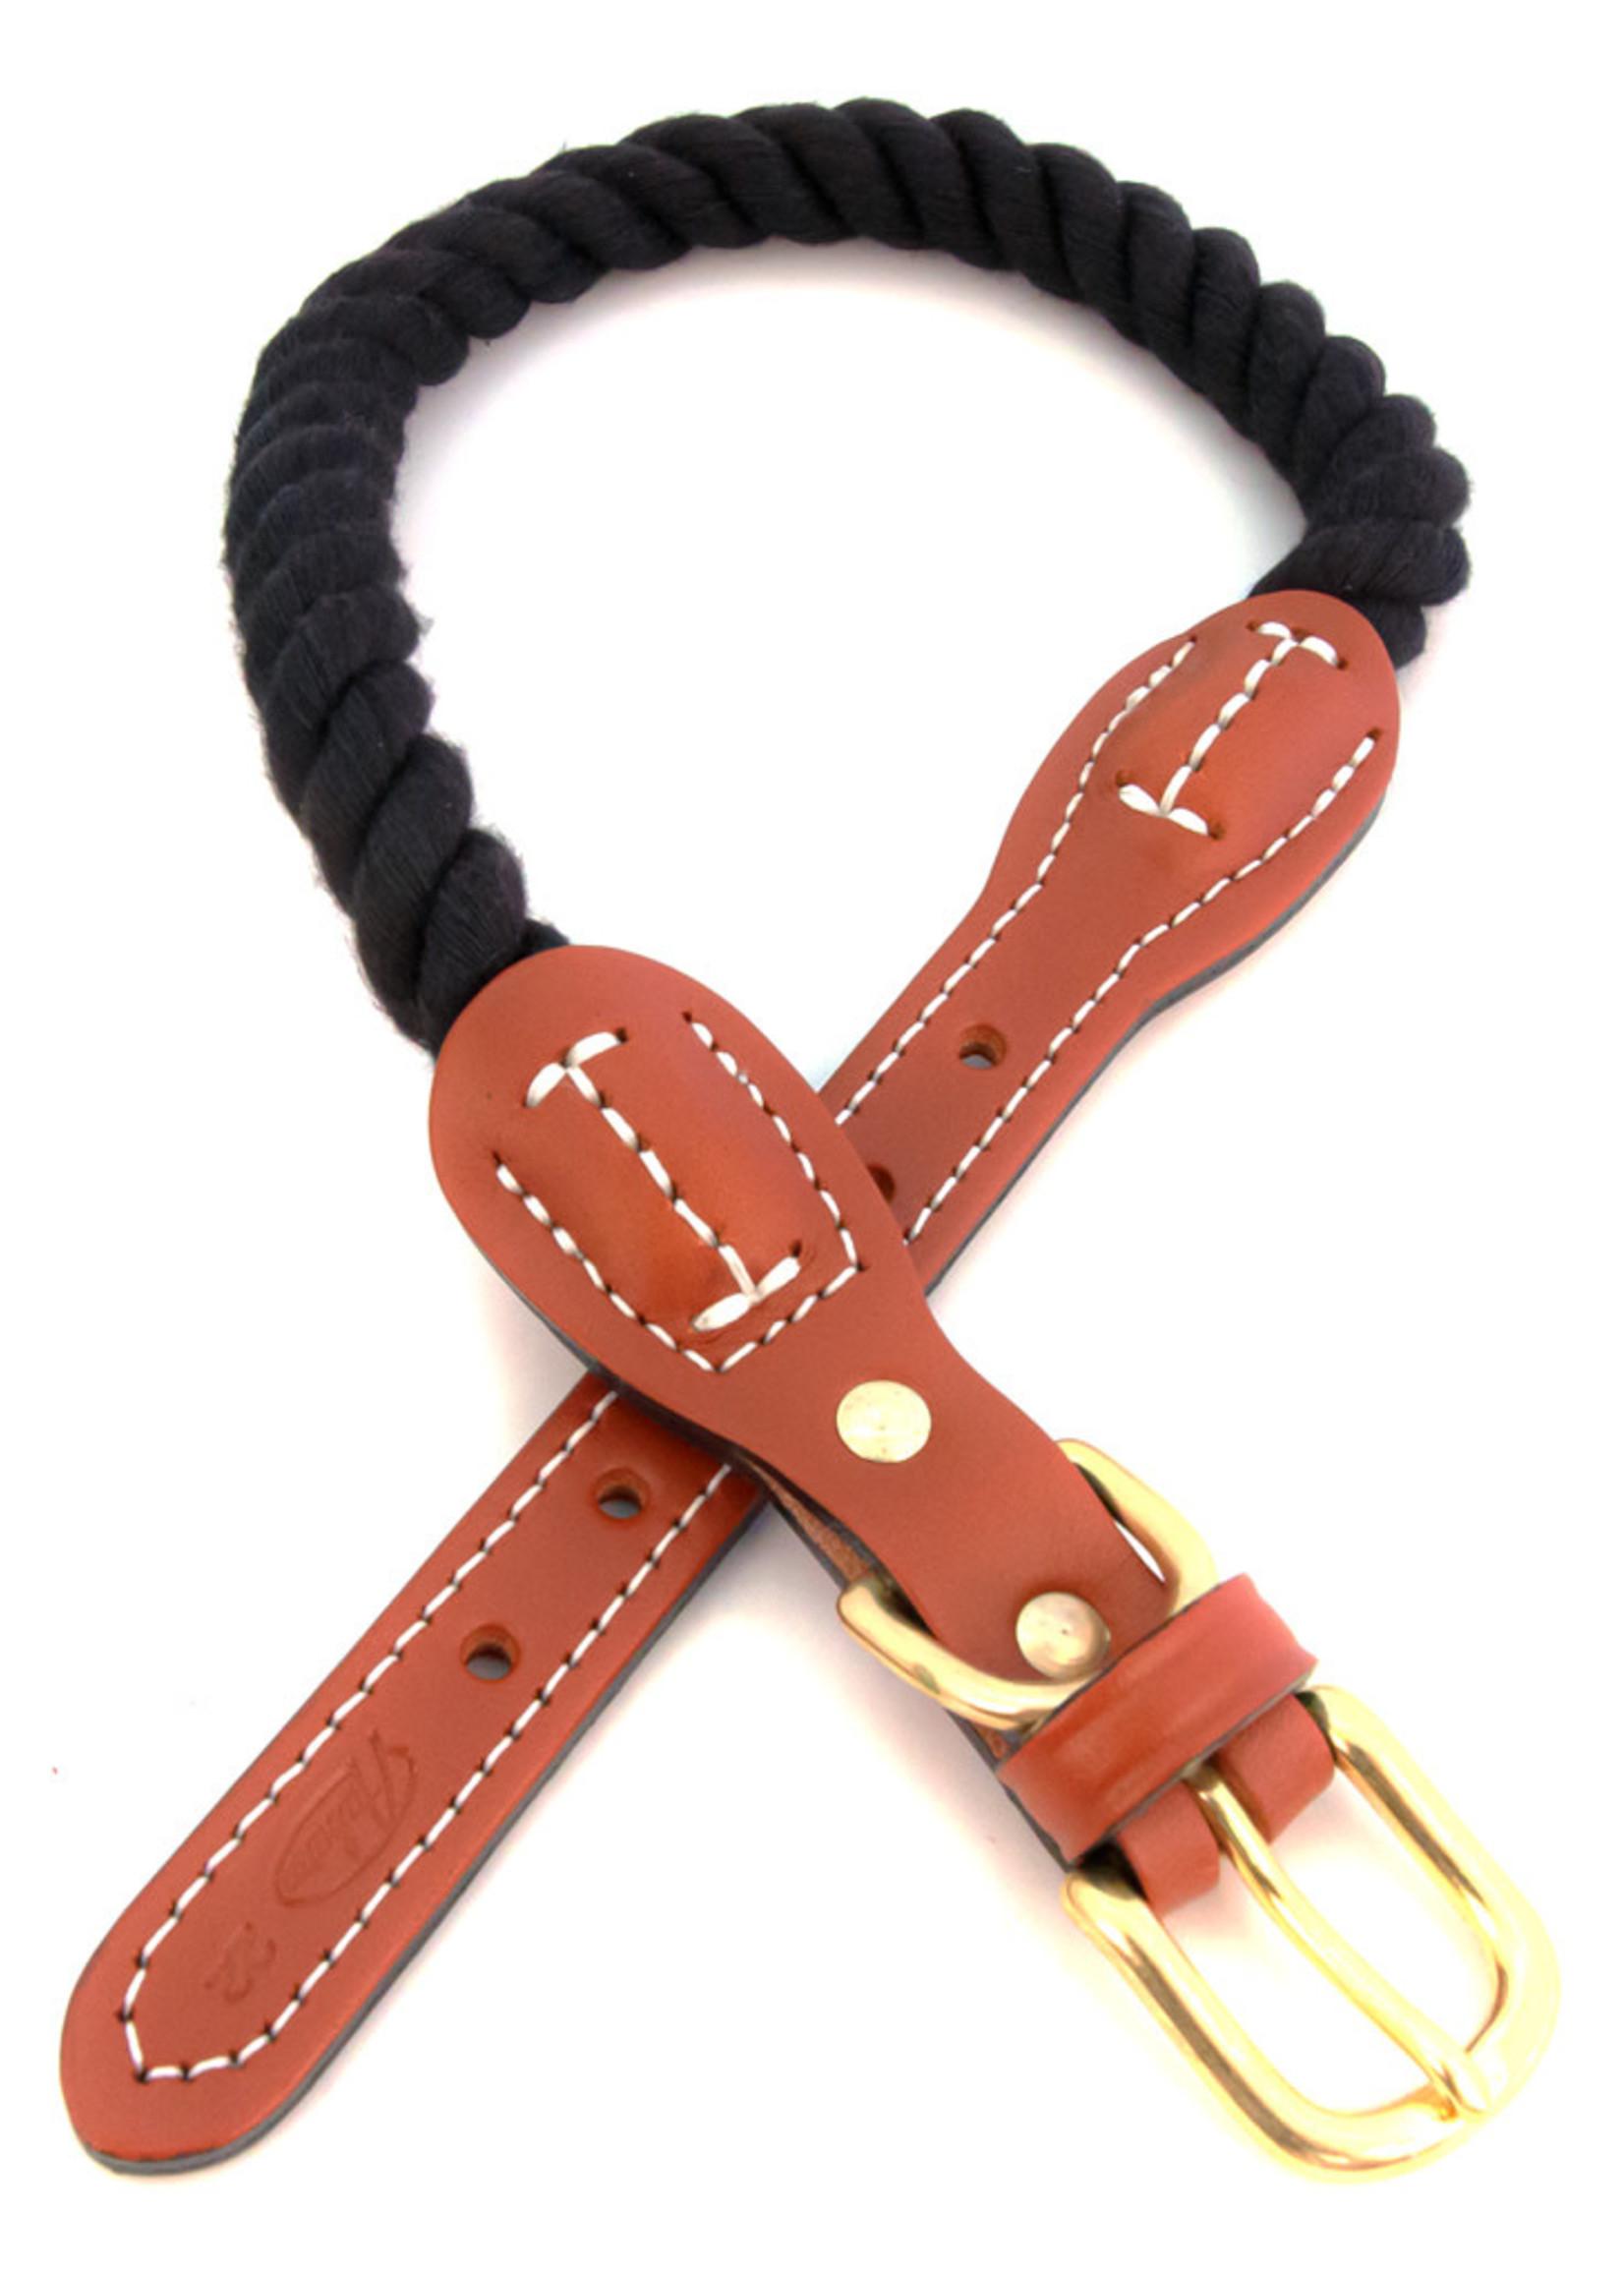 "Auburn Leathercrafters Auburn Leather Black Cotton/Leather Collar 3/4""x22"""